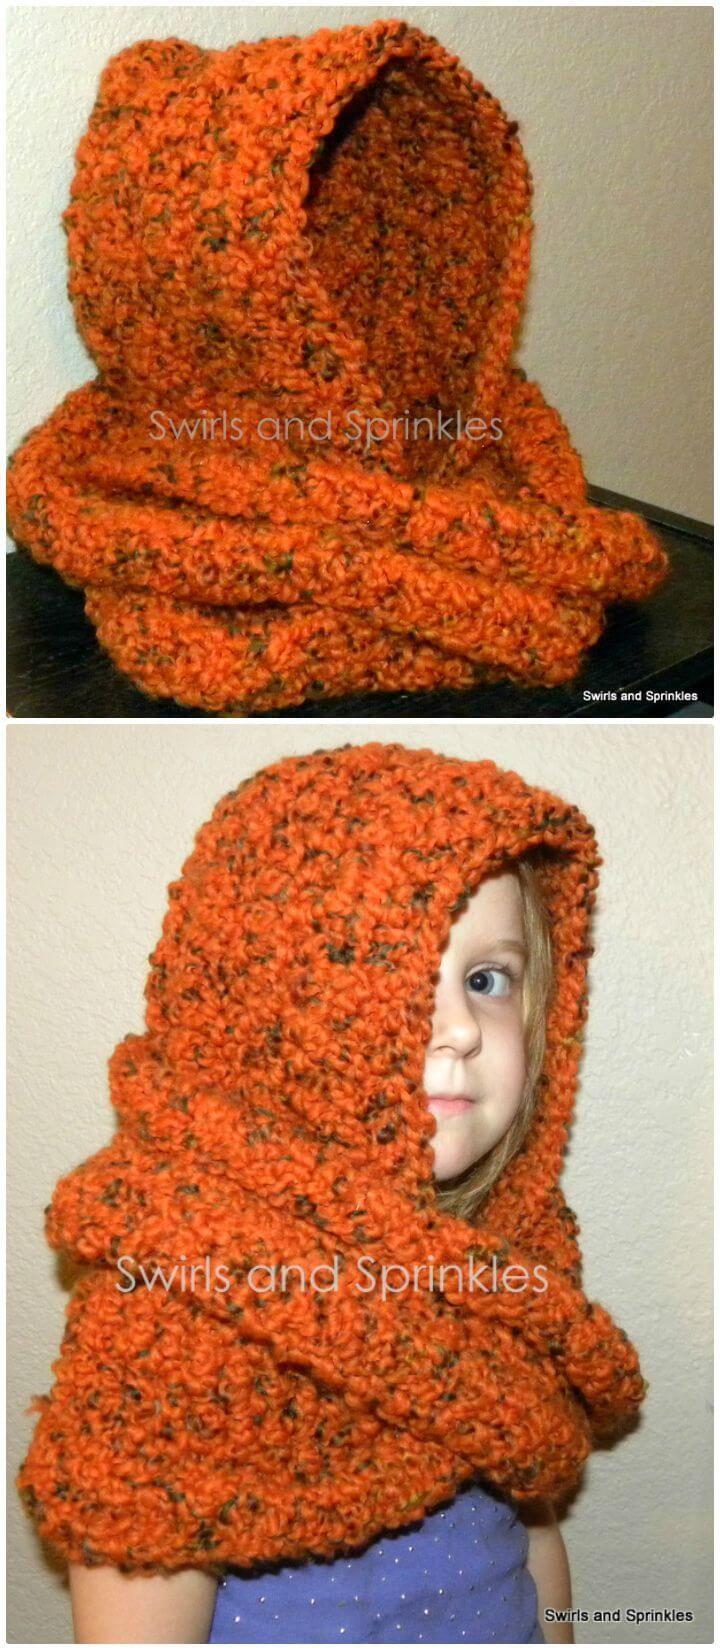 31 Free Crochet Hooded Scarf Patterns | Hooded scarf pattern ...